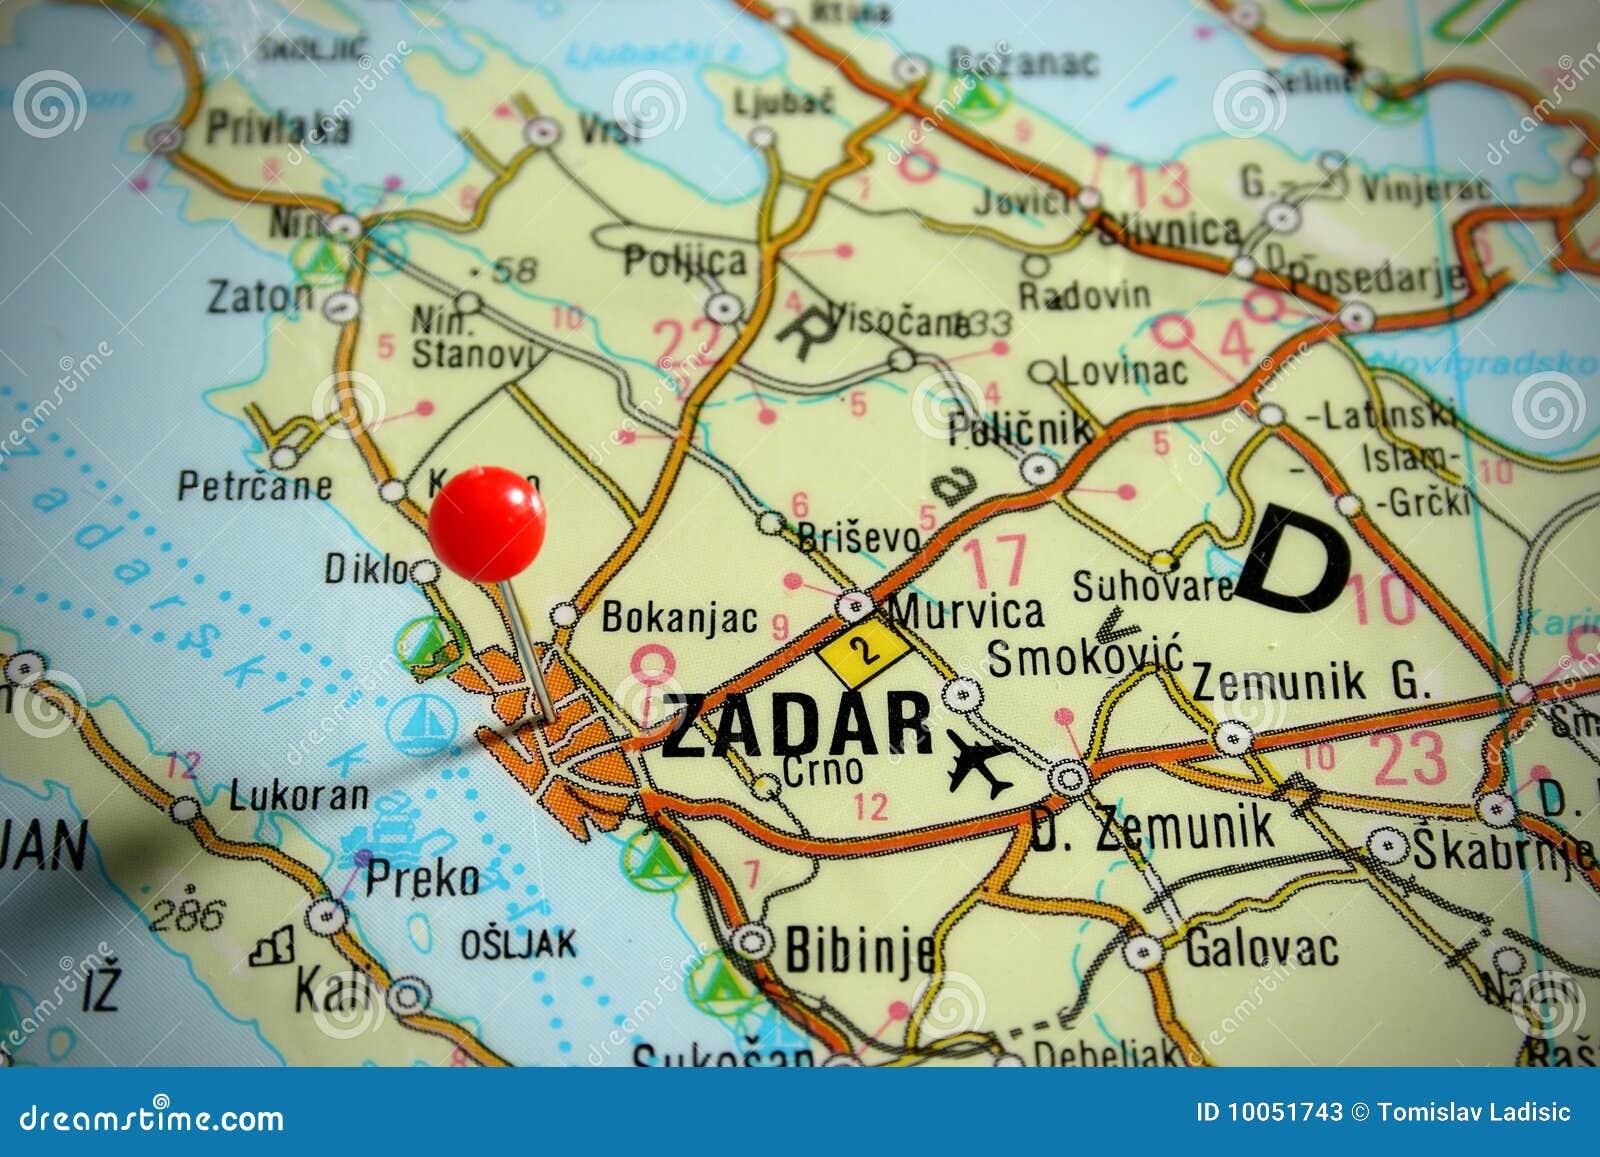 zadar kroatien karte Karte von Kroatien   Zadar stockbild. Bild von zieleinheit   10051743 zadar kroatien karte